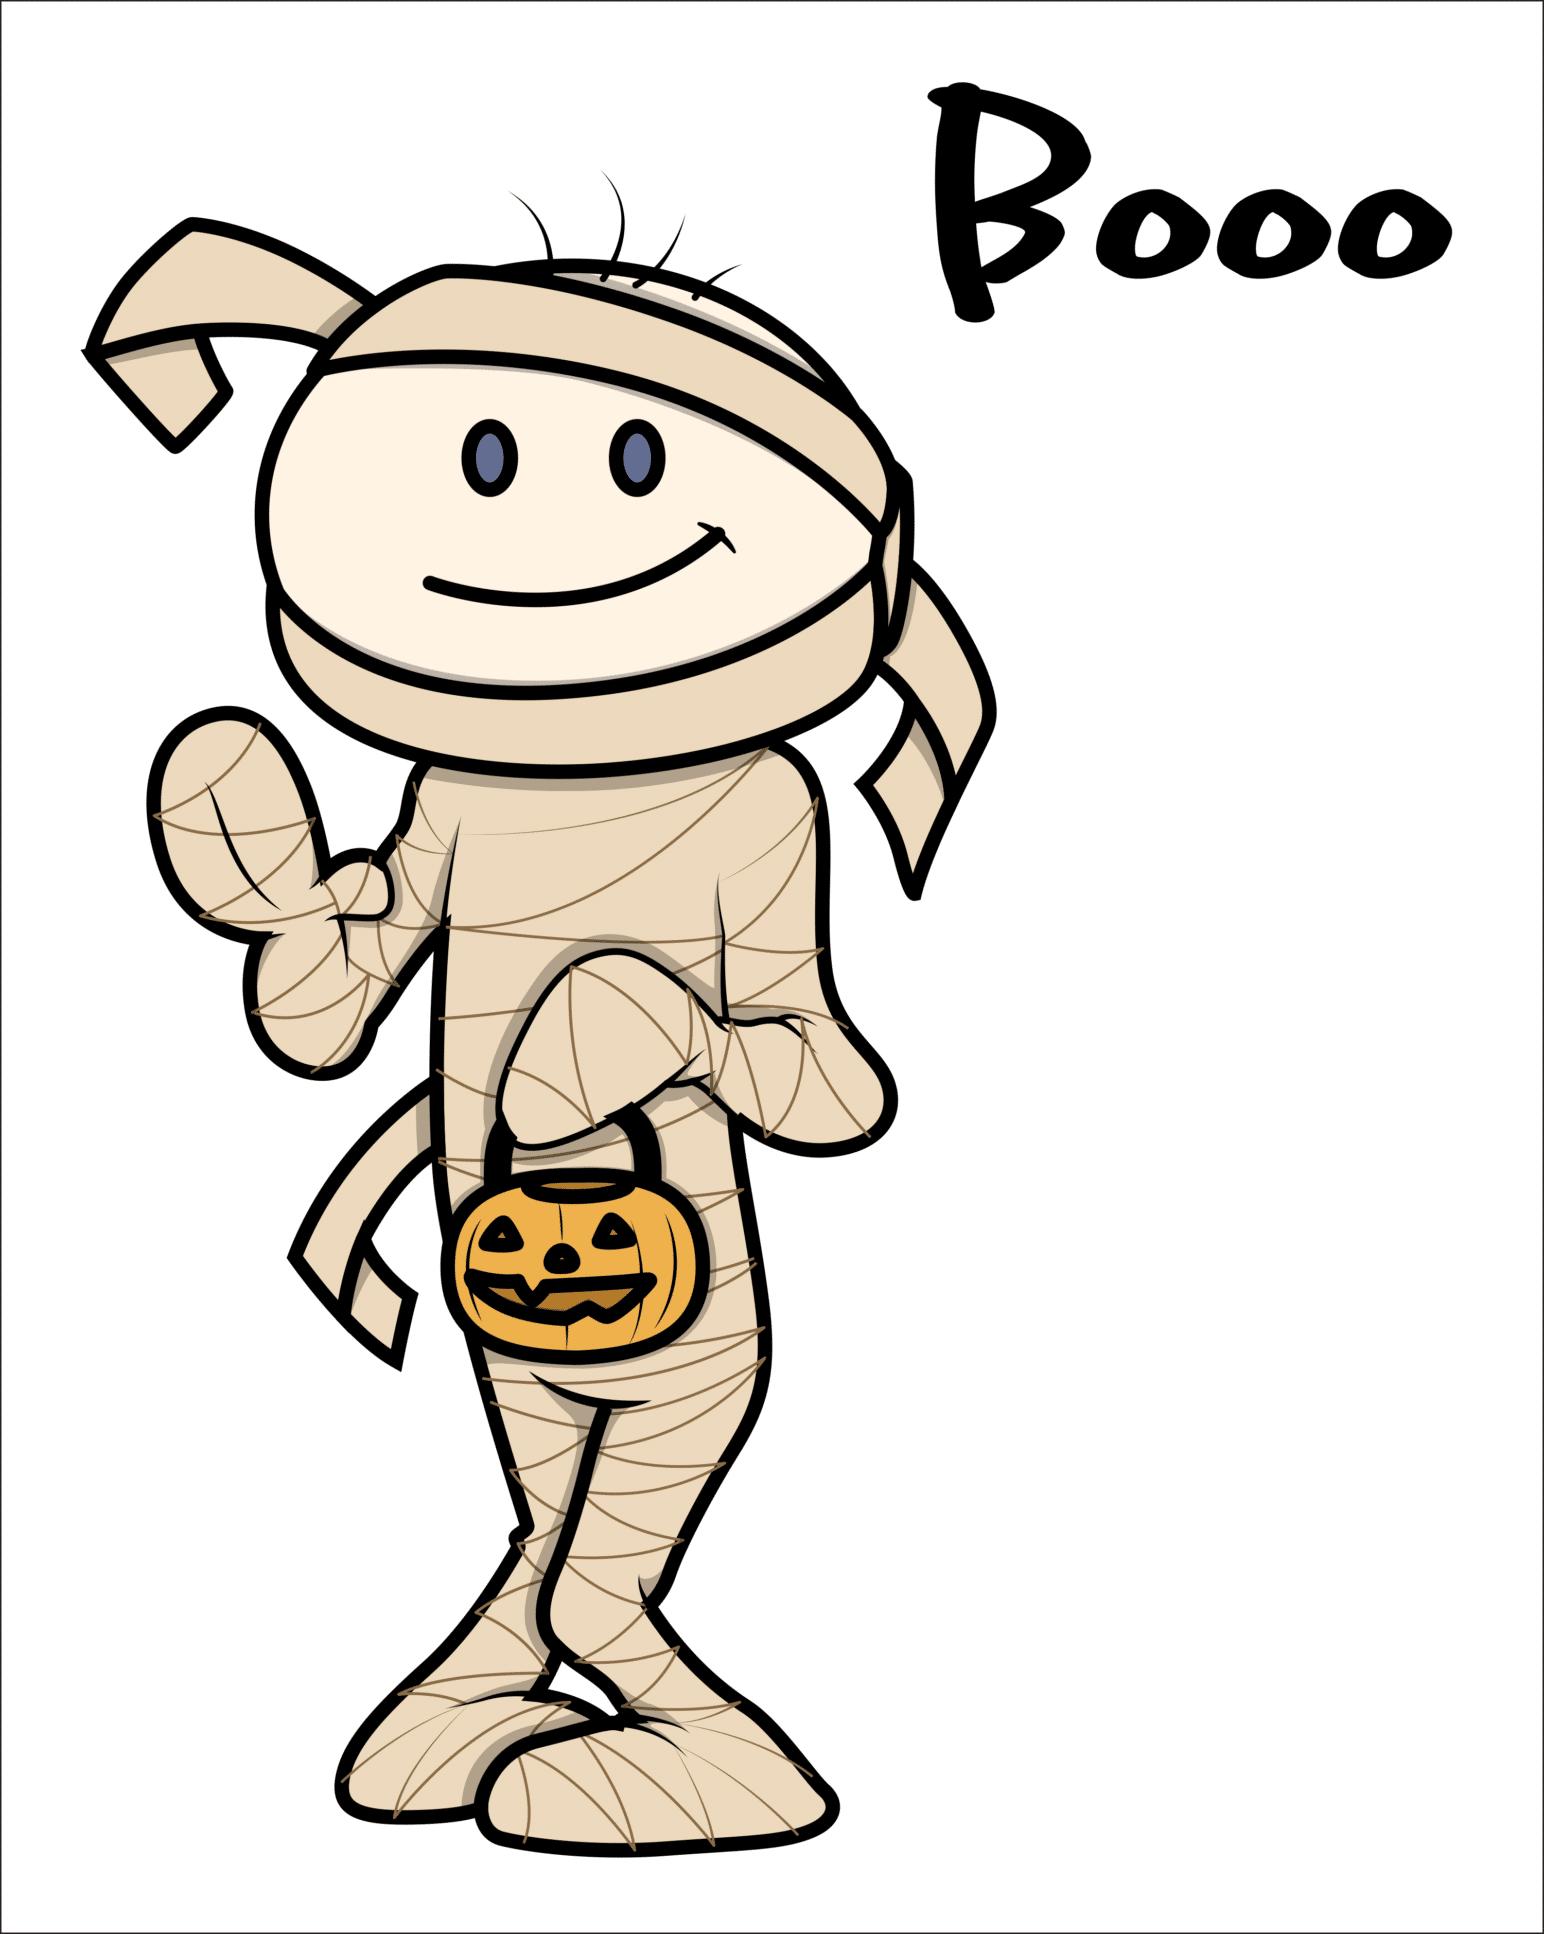 kid-halloween-mummy-dress-vector-cartoon-illustration_XyYCsb